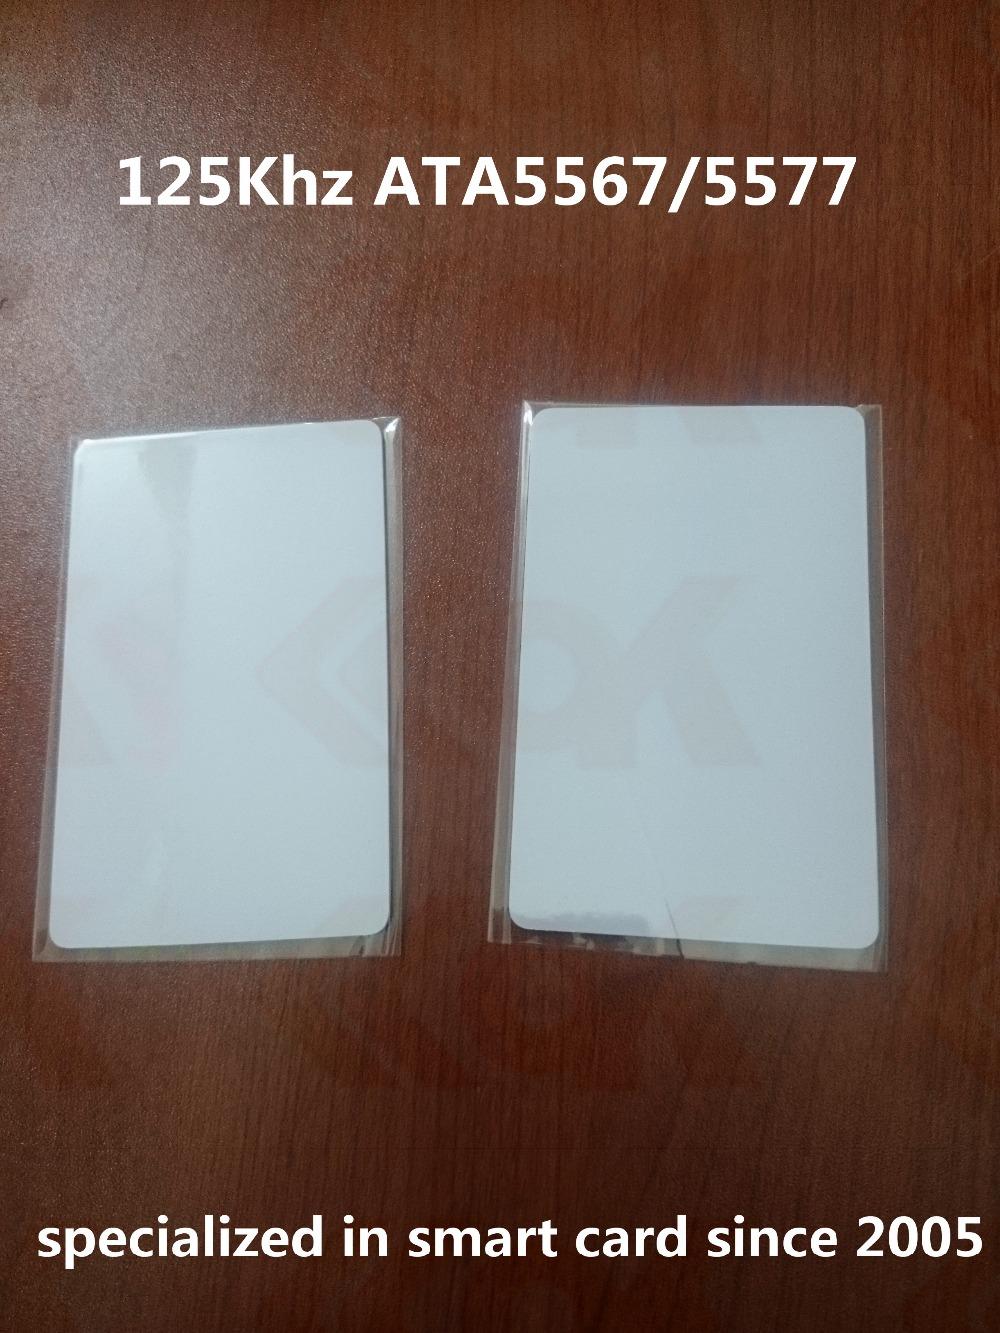 2000pcs/lot Smart Card proximity id cards T5577 T5567 Writable 125khz rfid card(China (Mainland))